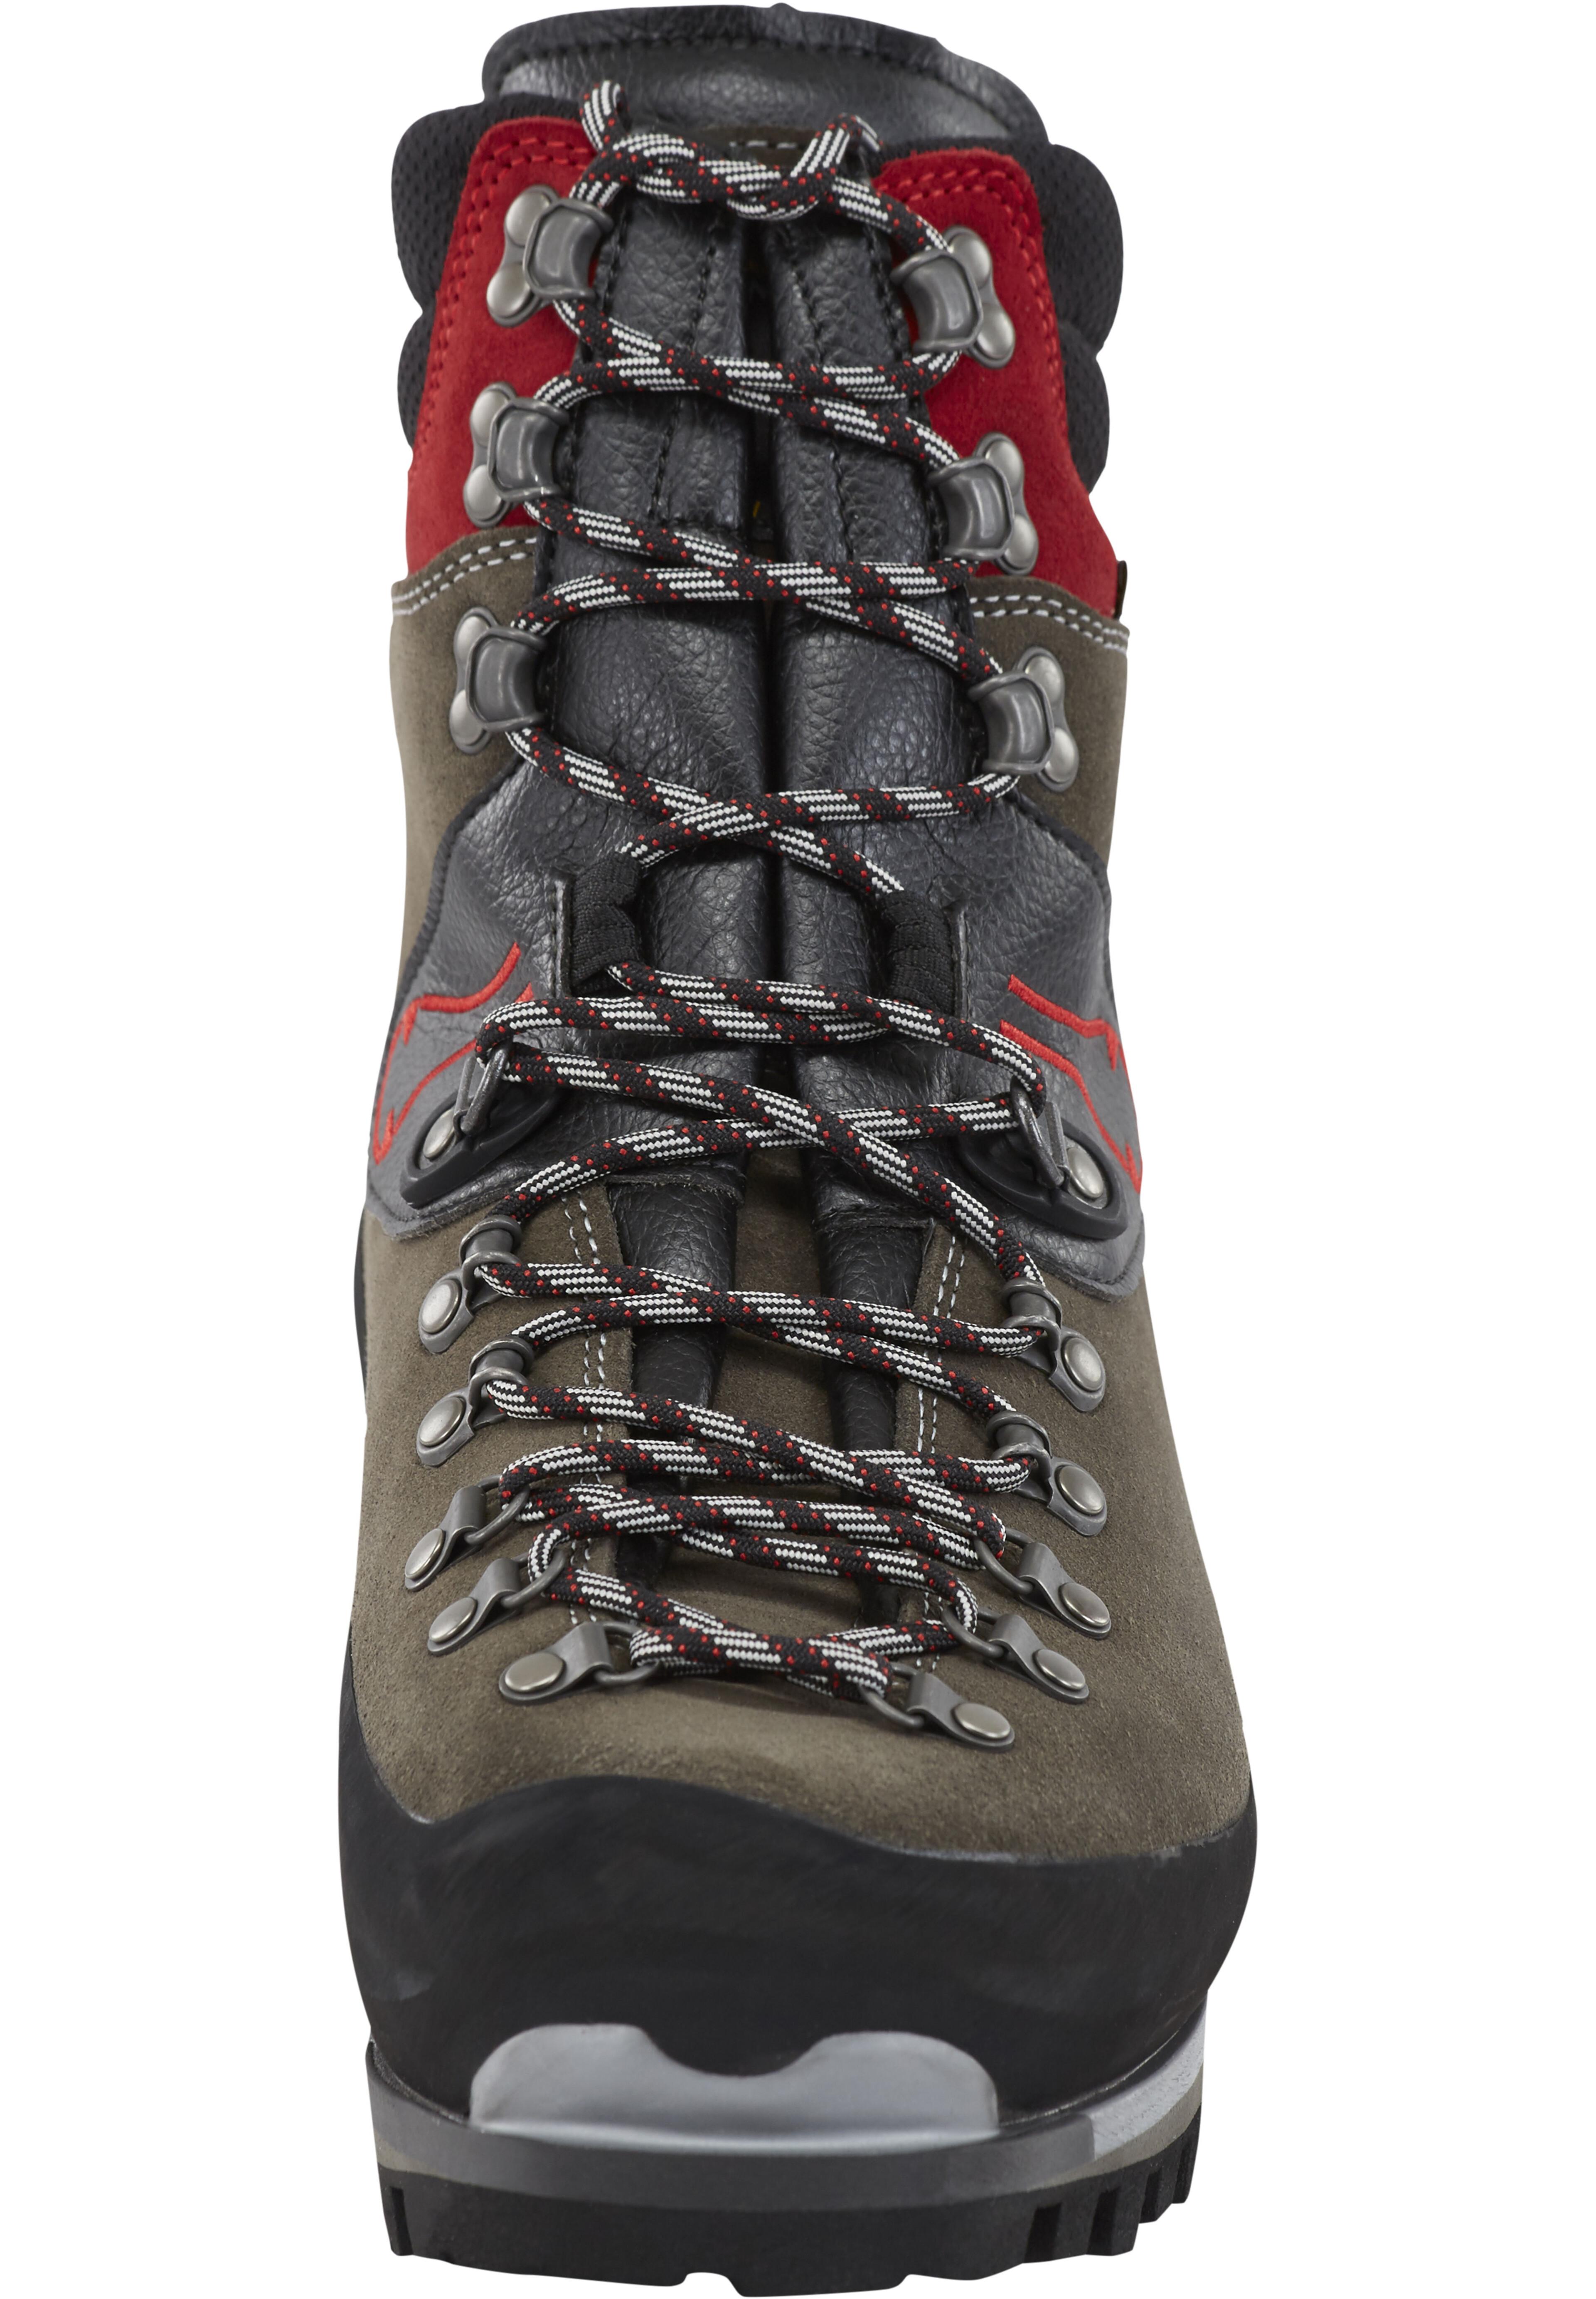 La Sportiva Karakorum Evo Gtx Shoes Anthracite Red At